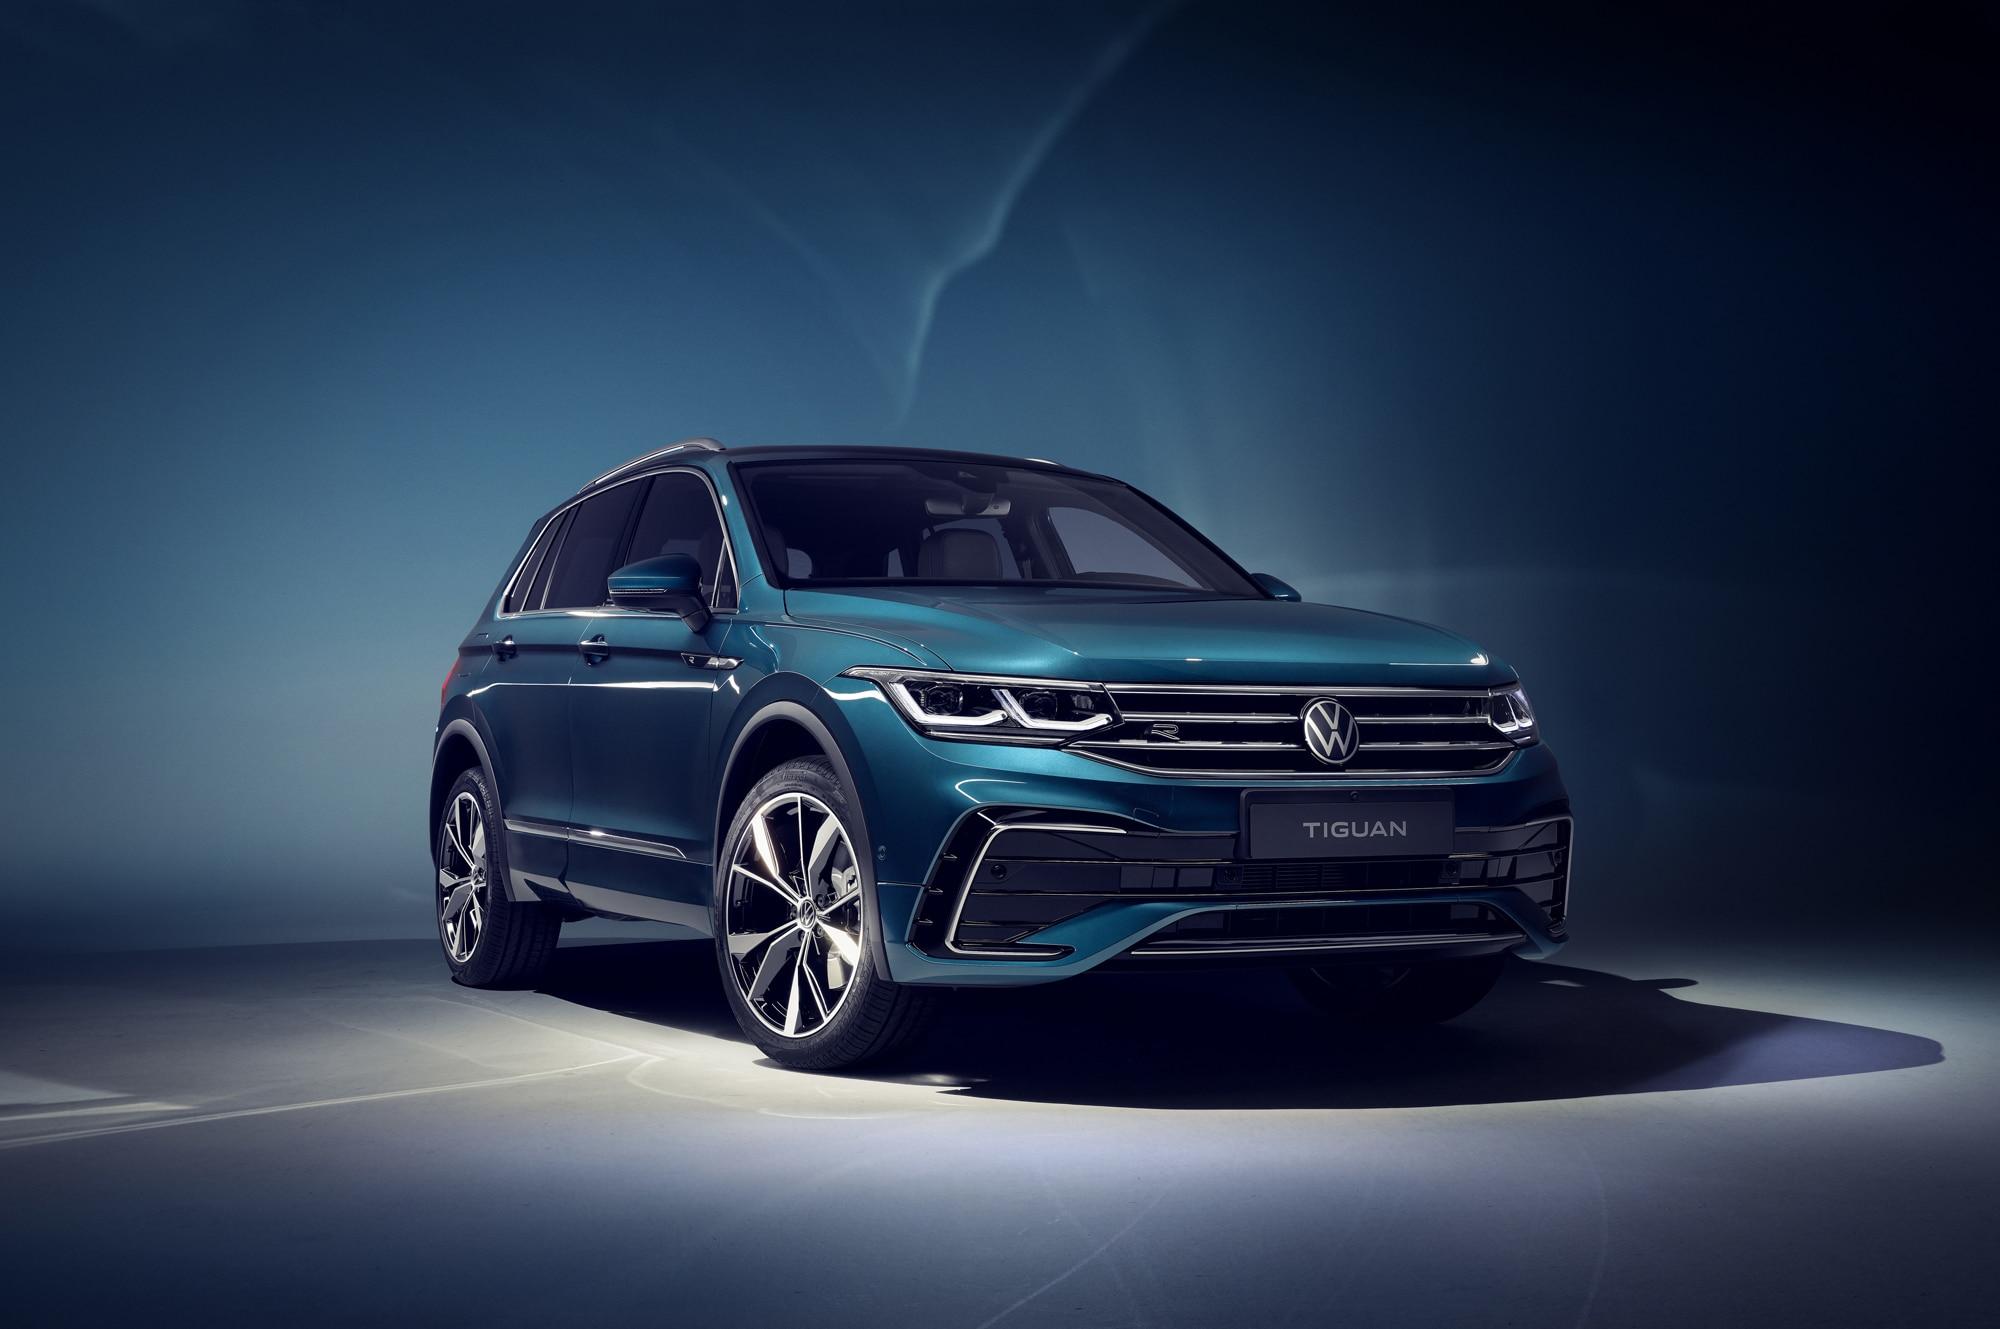 Volkswagen Tiguan 2021: комплектации, характеристики, дизайн, кузов, фото, видео